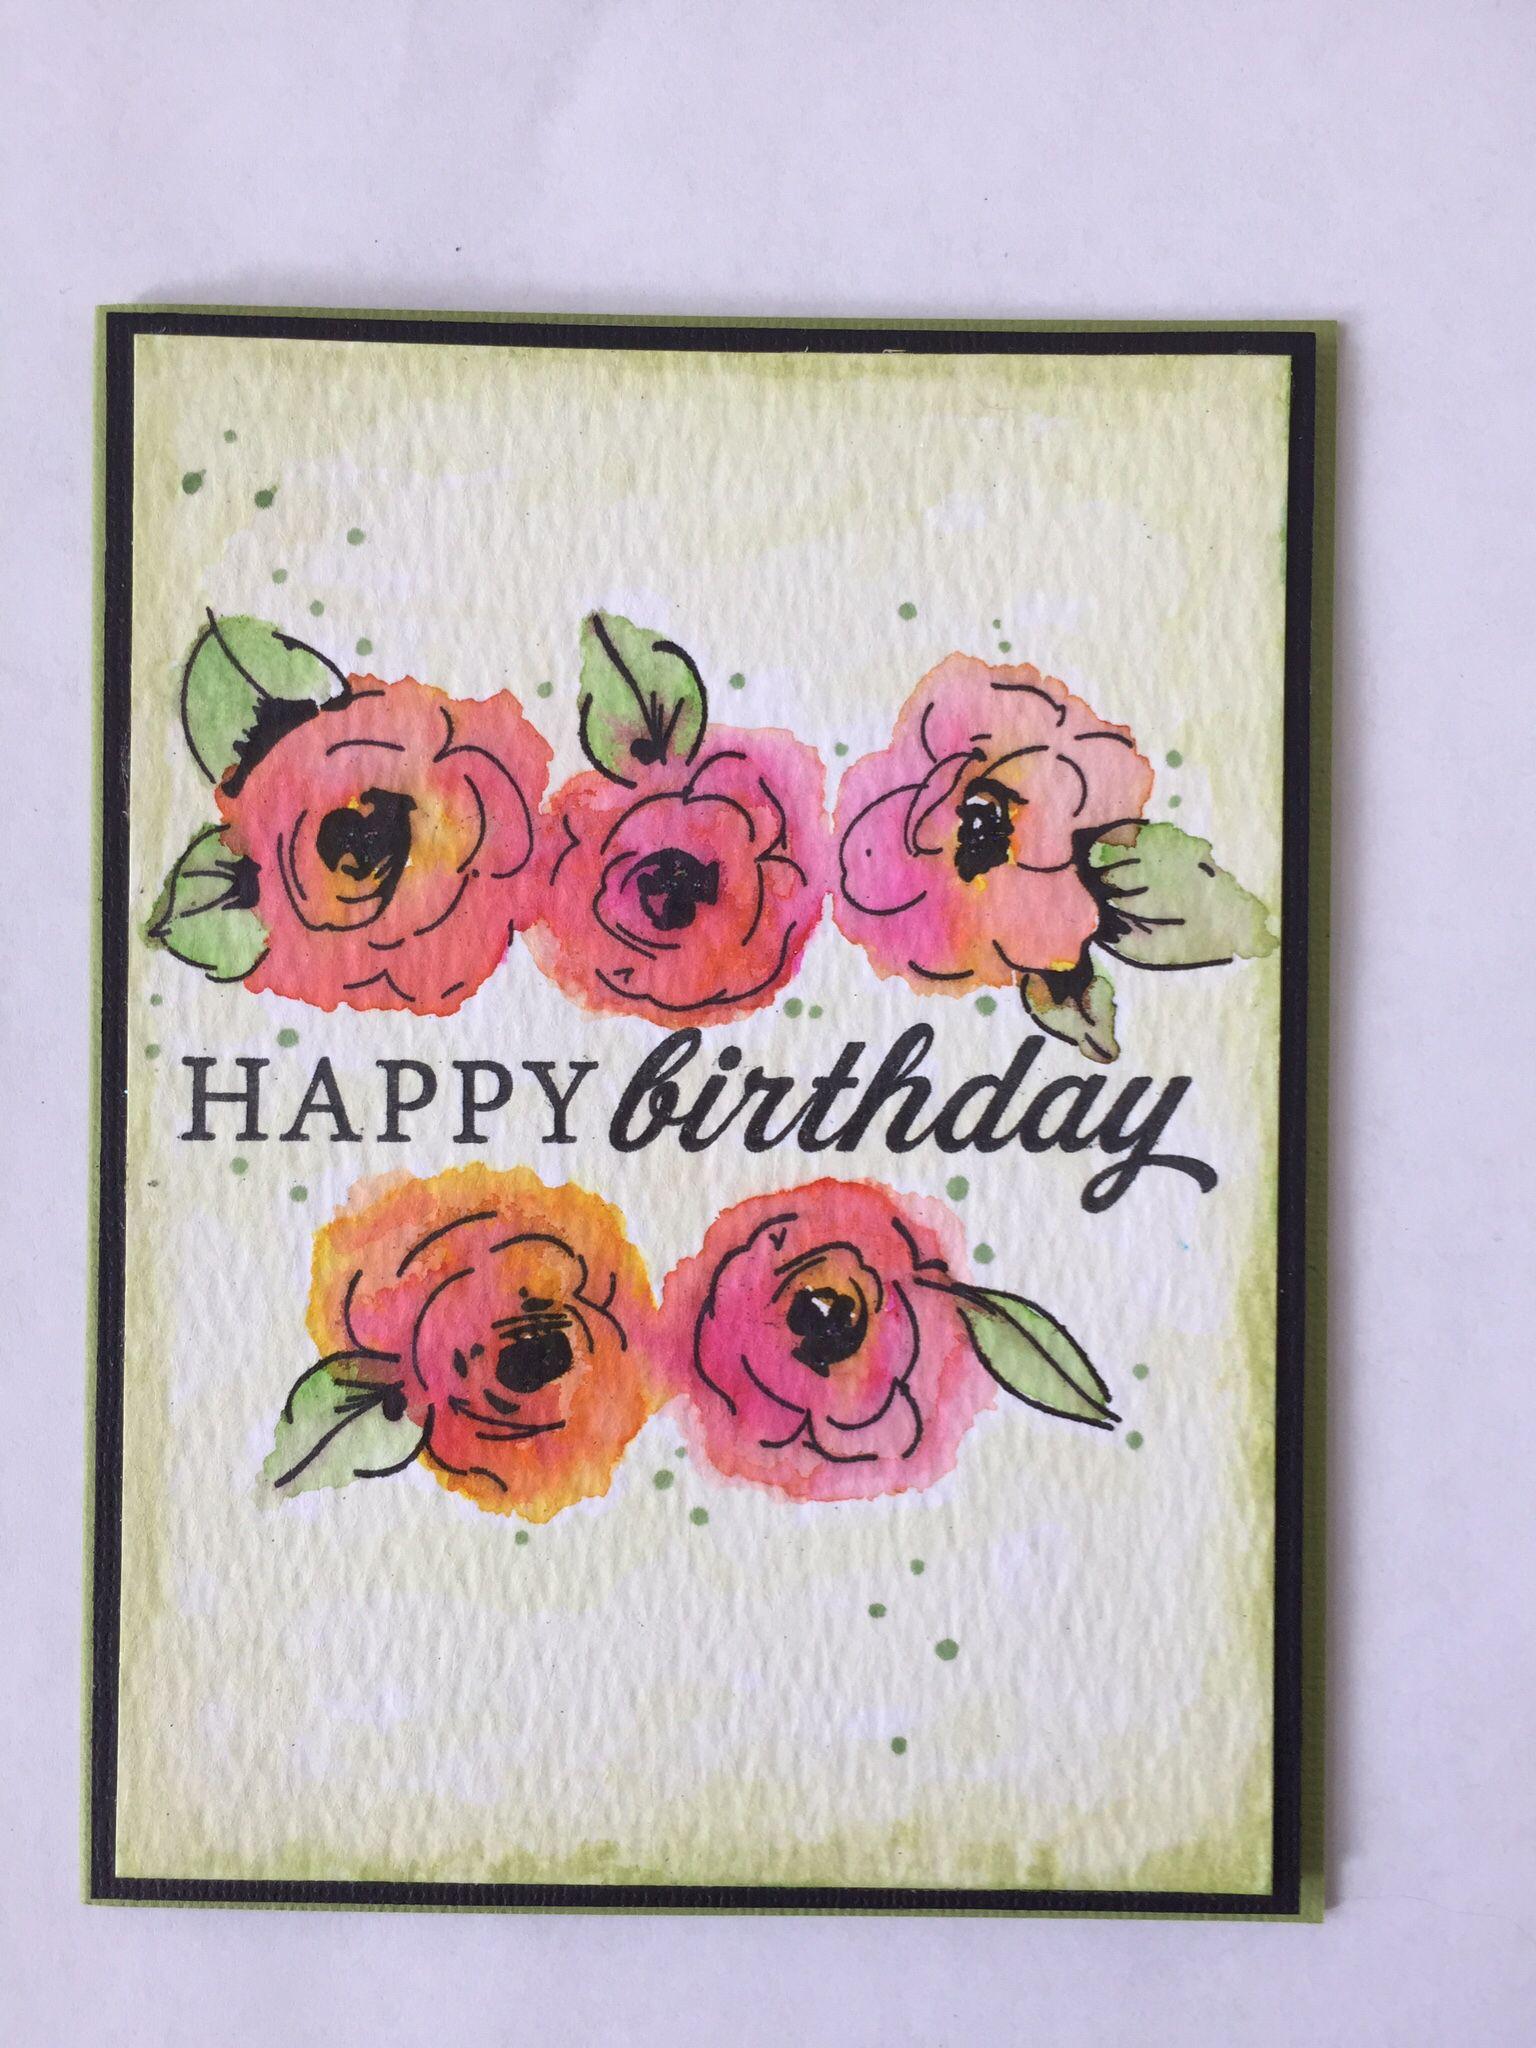 Birthday card altenew painted flowers altenew painted flowers birthday card altenew painted flowers izmirmasajfo Choice Image